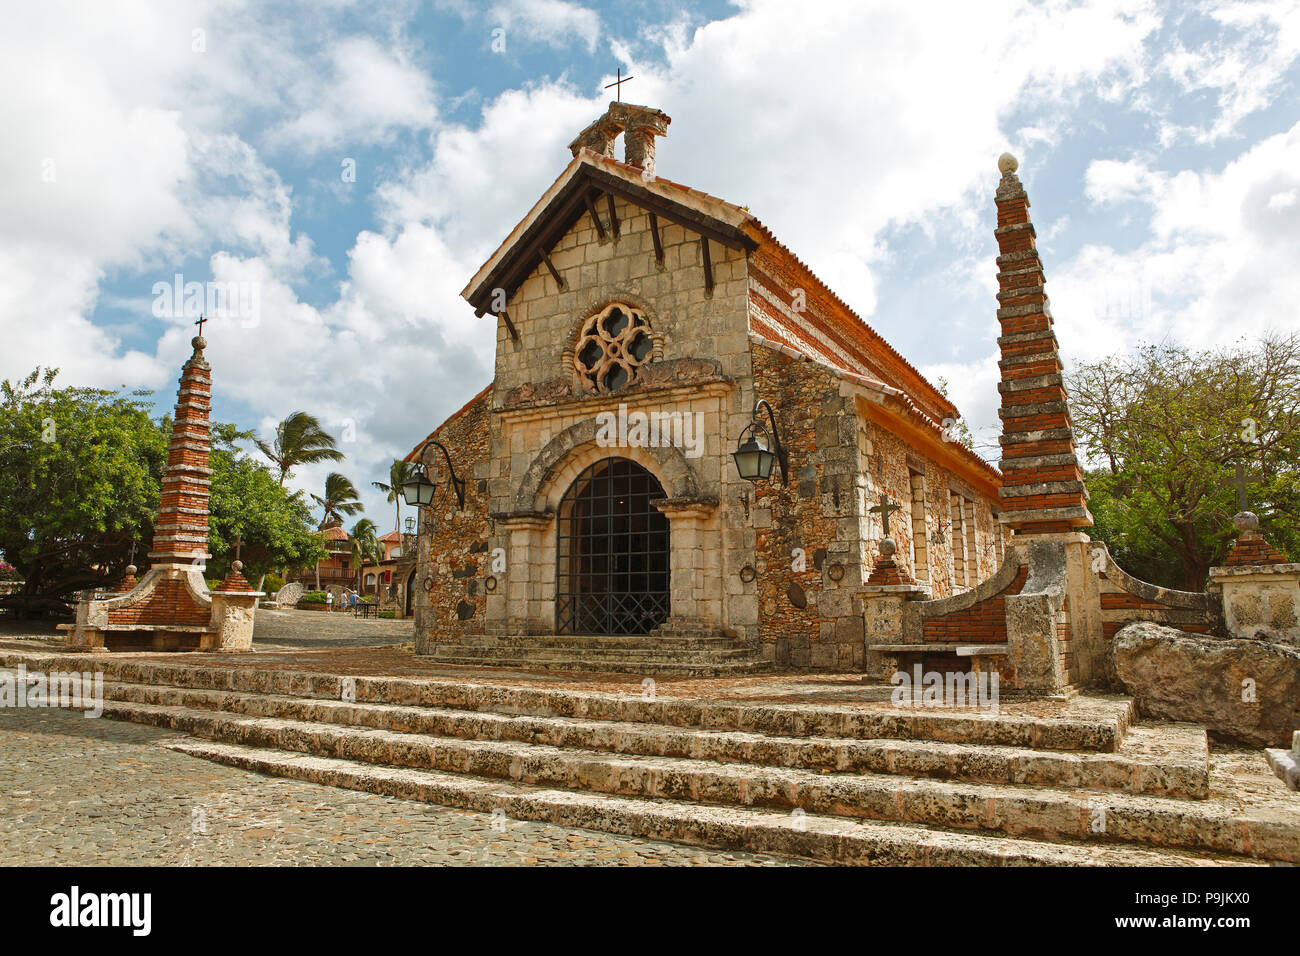 Catholic Church of St. Stanislaus, Casa de Campo, Altos de Chavón, La Romana, Dominican Republic - Stock Image